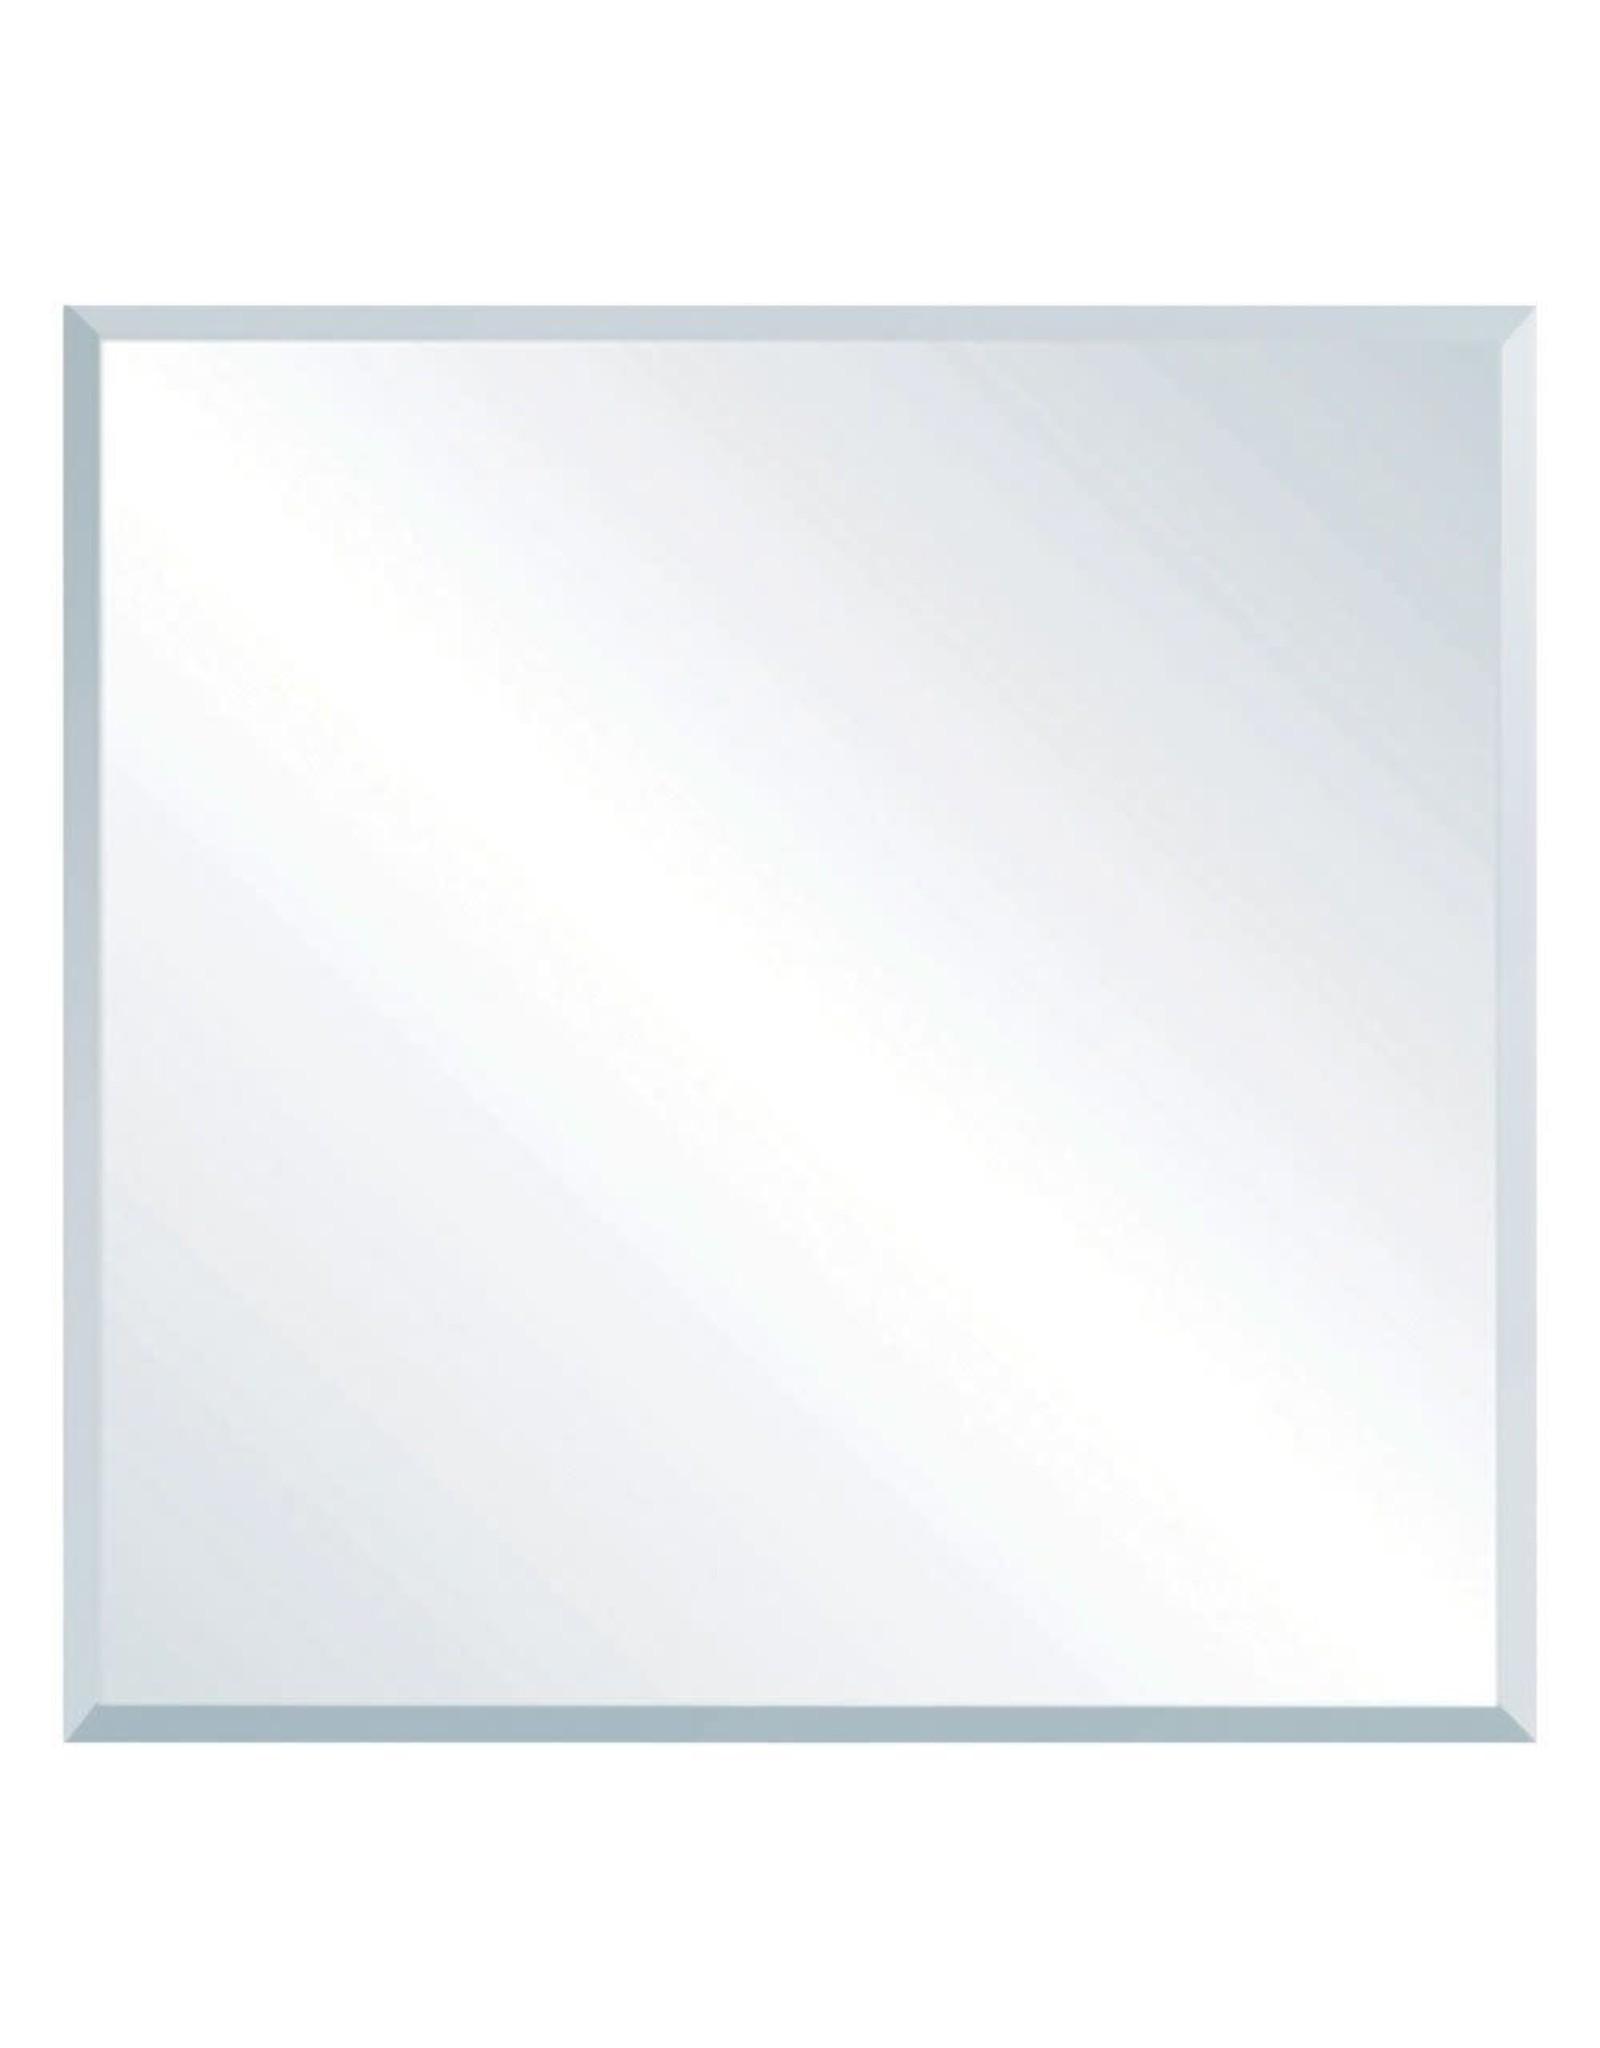 FIENZA 1200x800, FIENZA, Bevel Edge Mirror